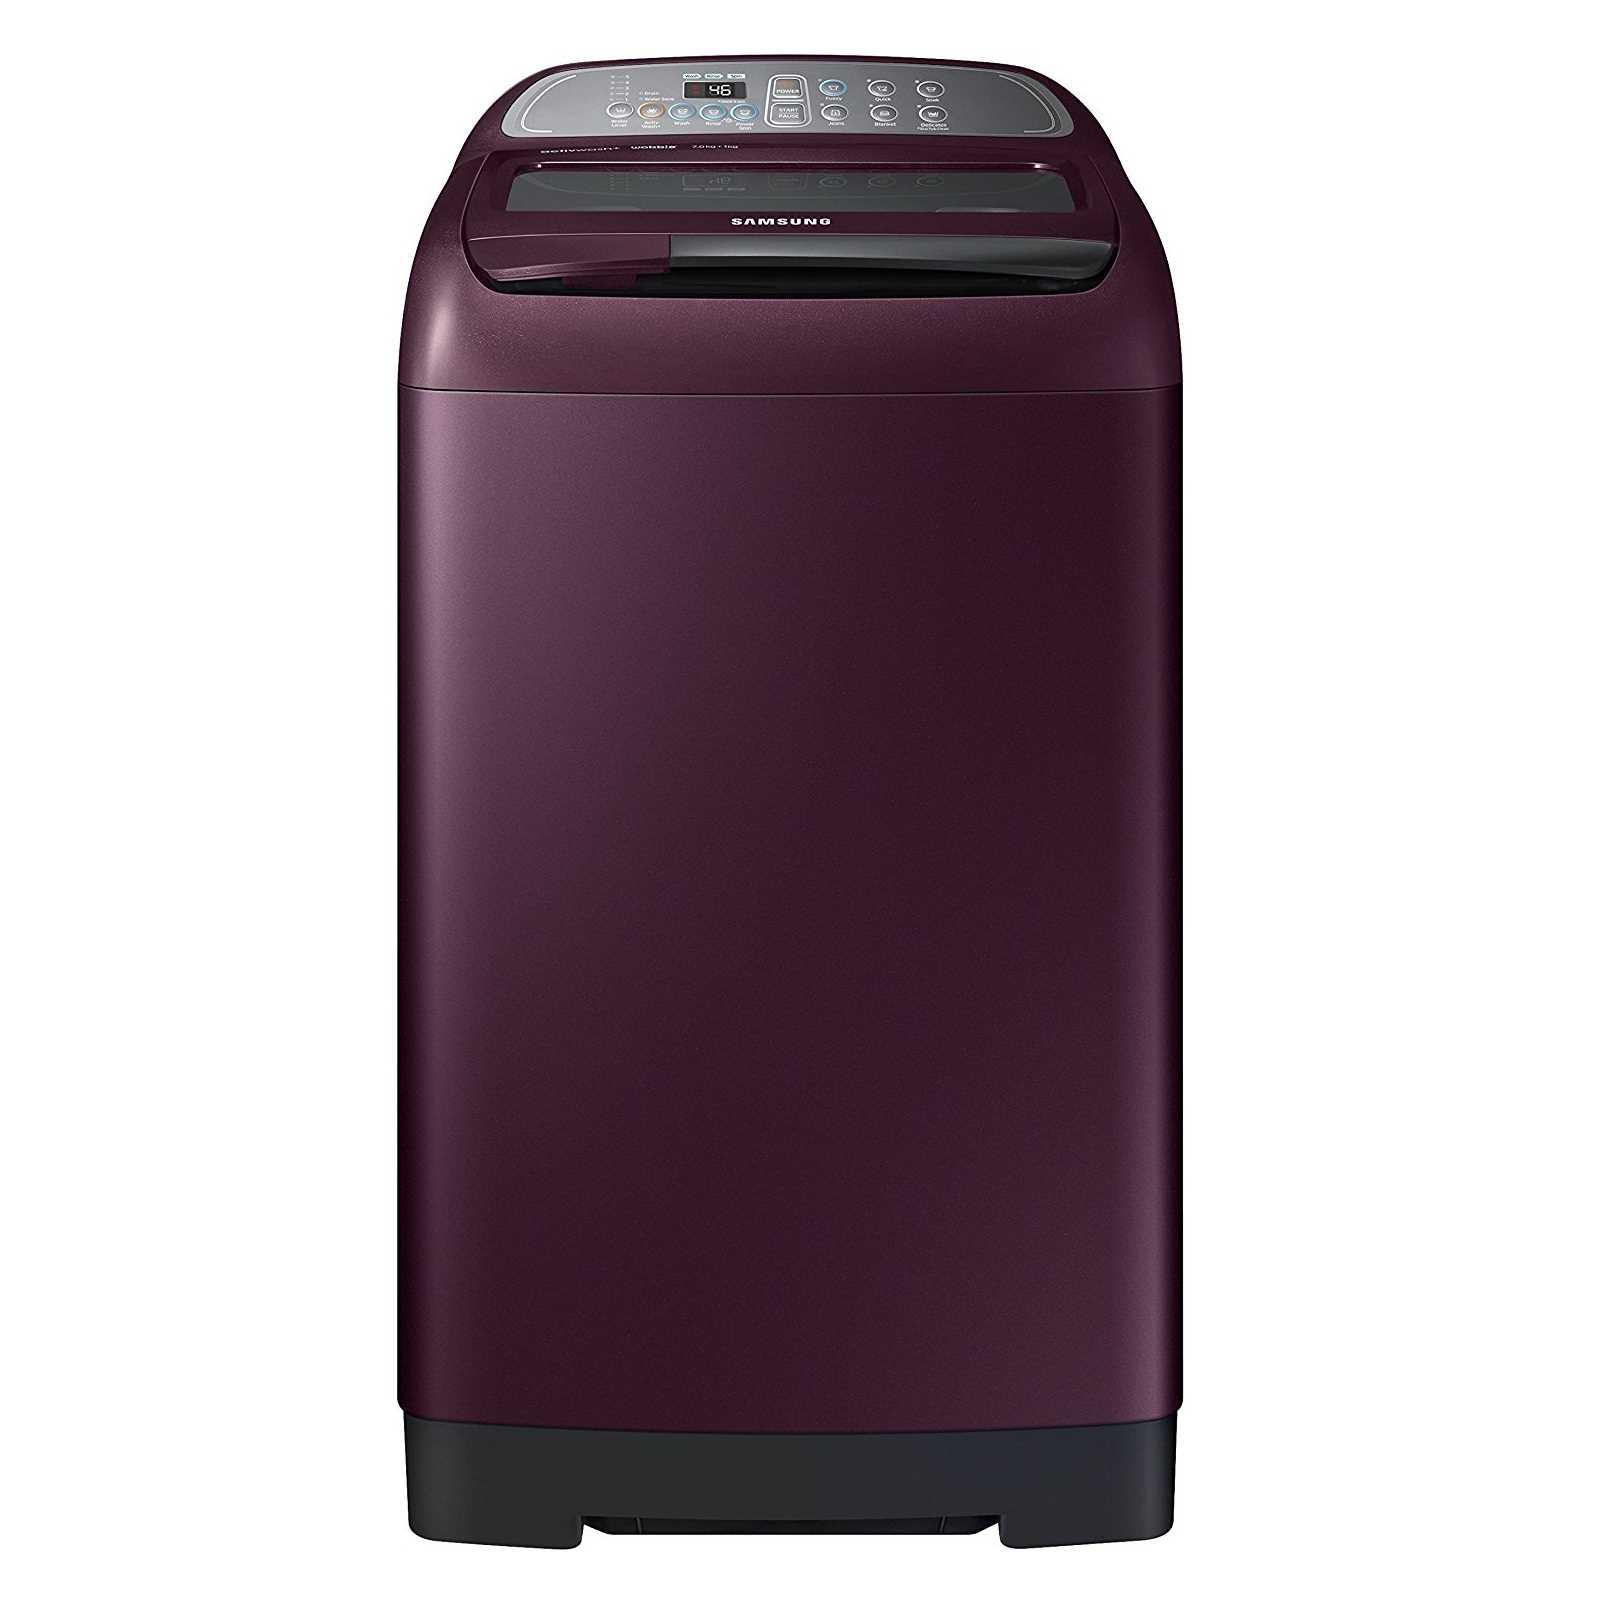 Samsung WA70M4000HP 7 Kg Fully Automatic Top Loading Washing Machine